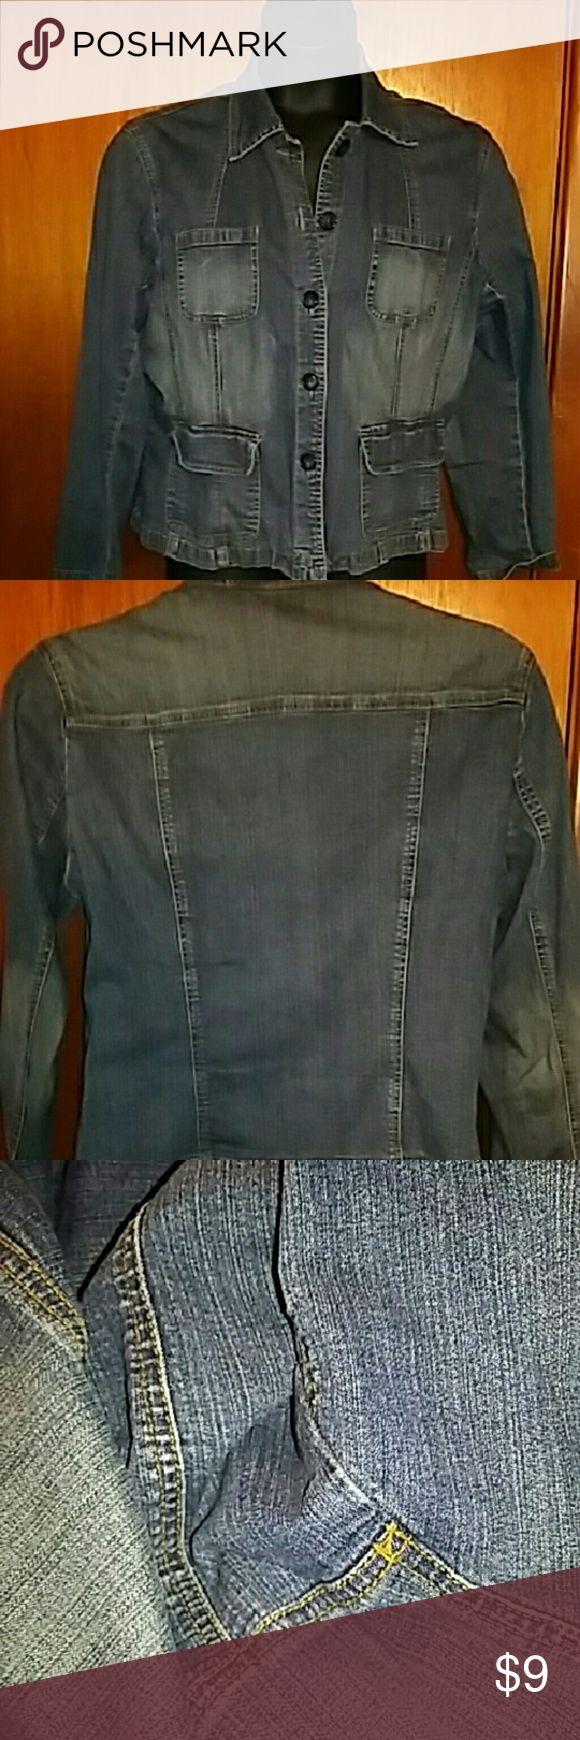 St John's stretch jean jacket.size xl St John's jean stretch jacket. Good condition St. John's Bay Jackets & Coats Jean Jackets